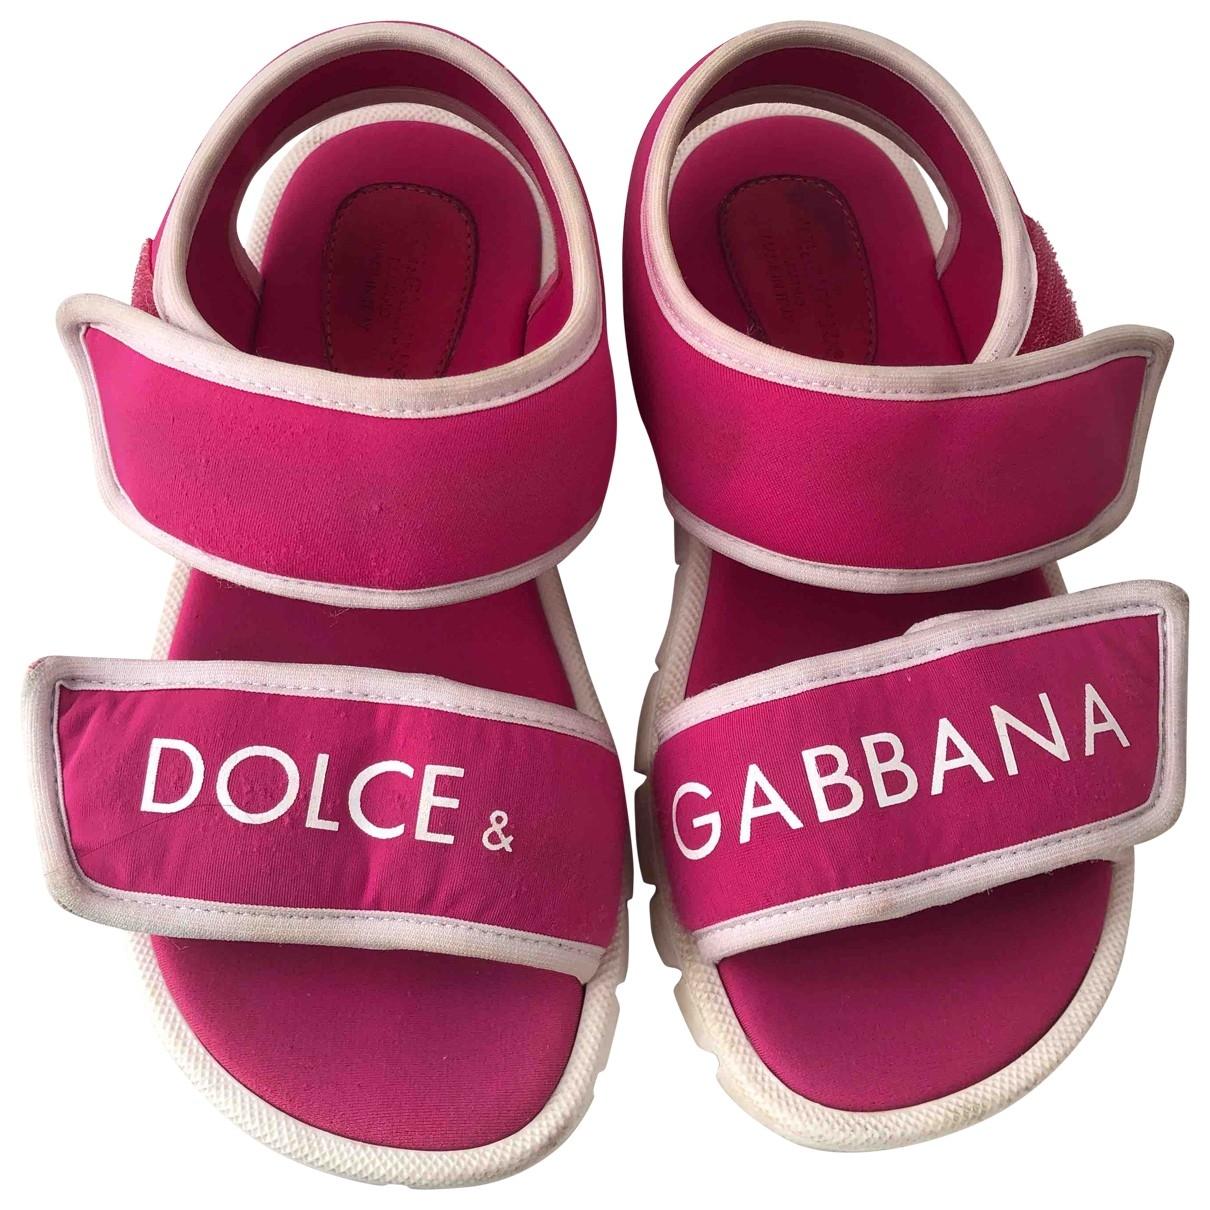 Dolce & Gabbana - Sandales   pour enfant - rose